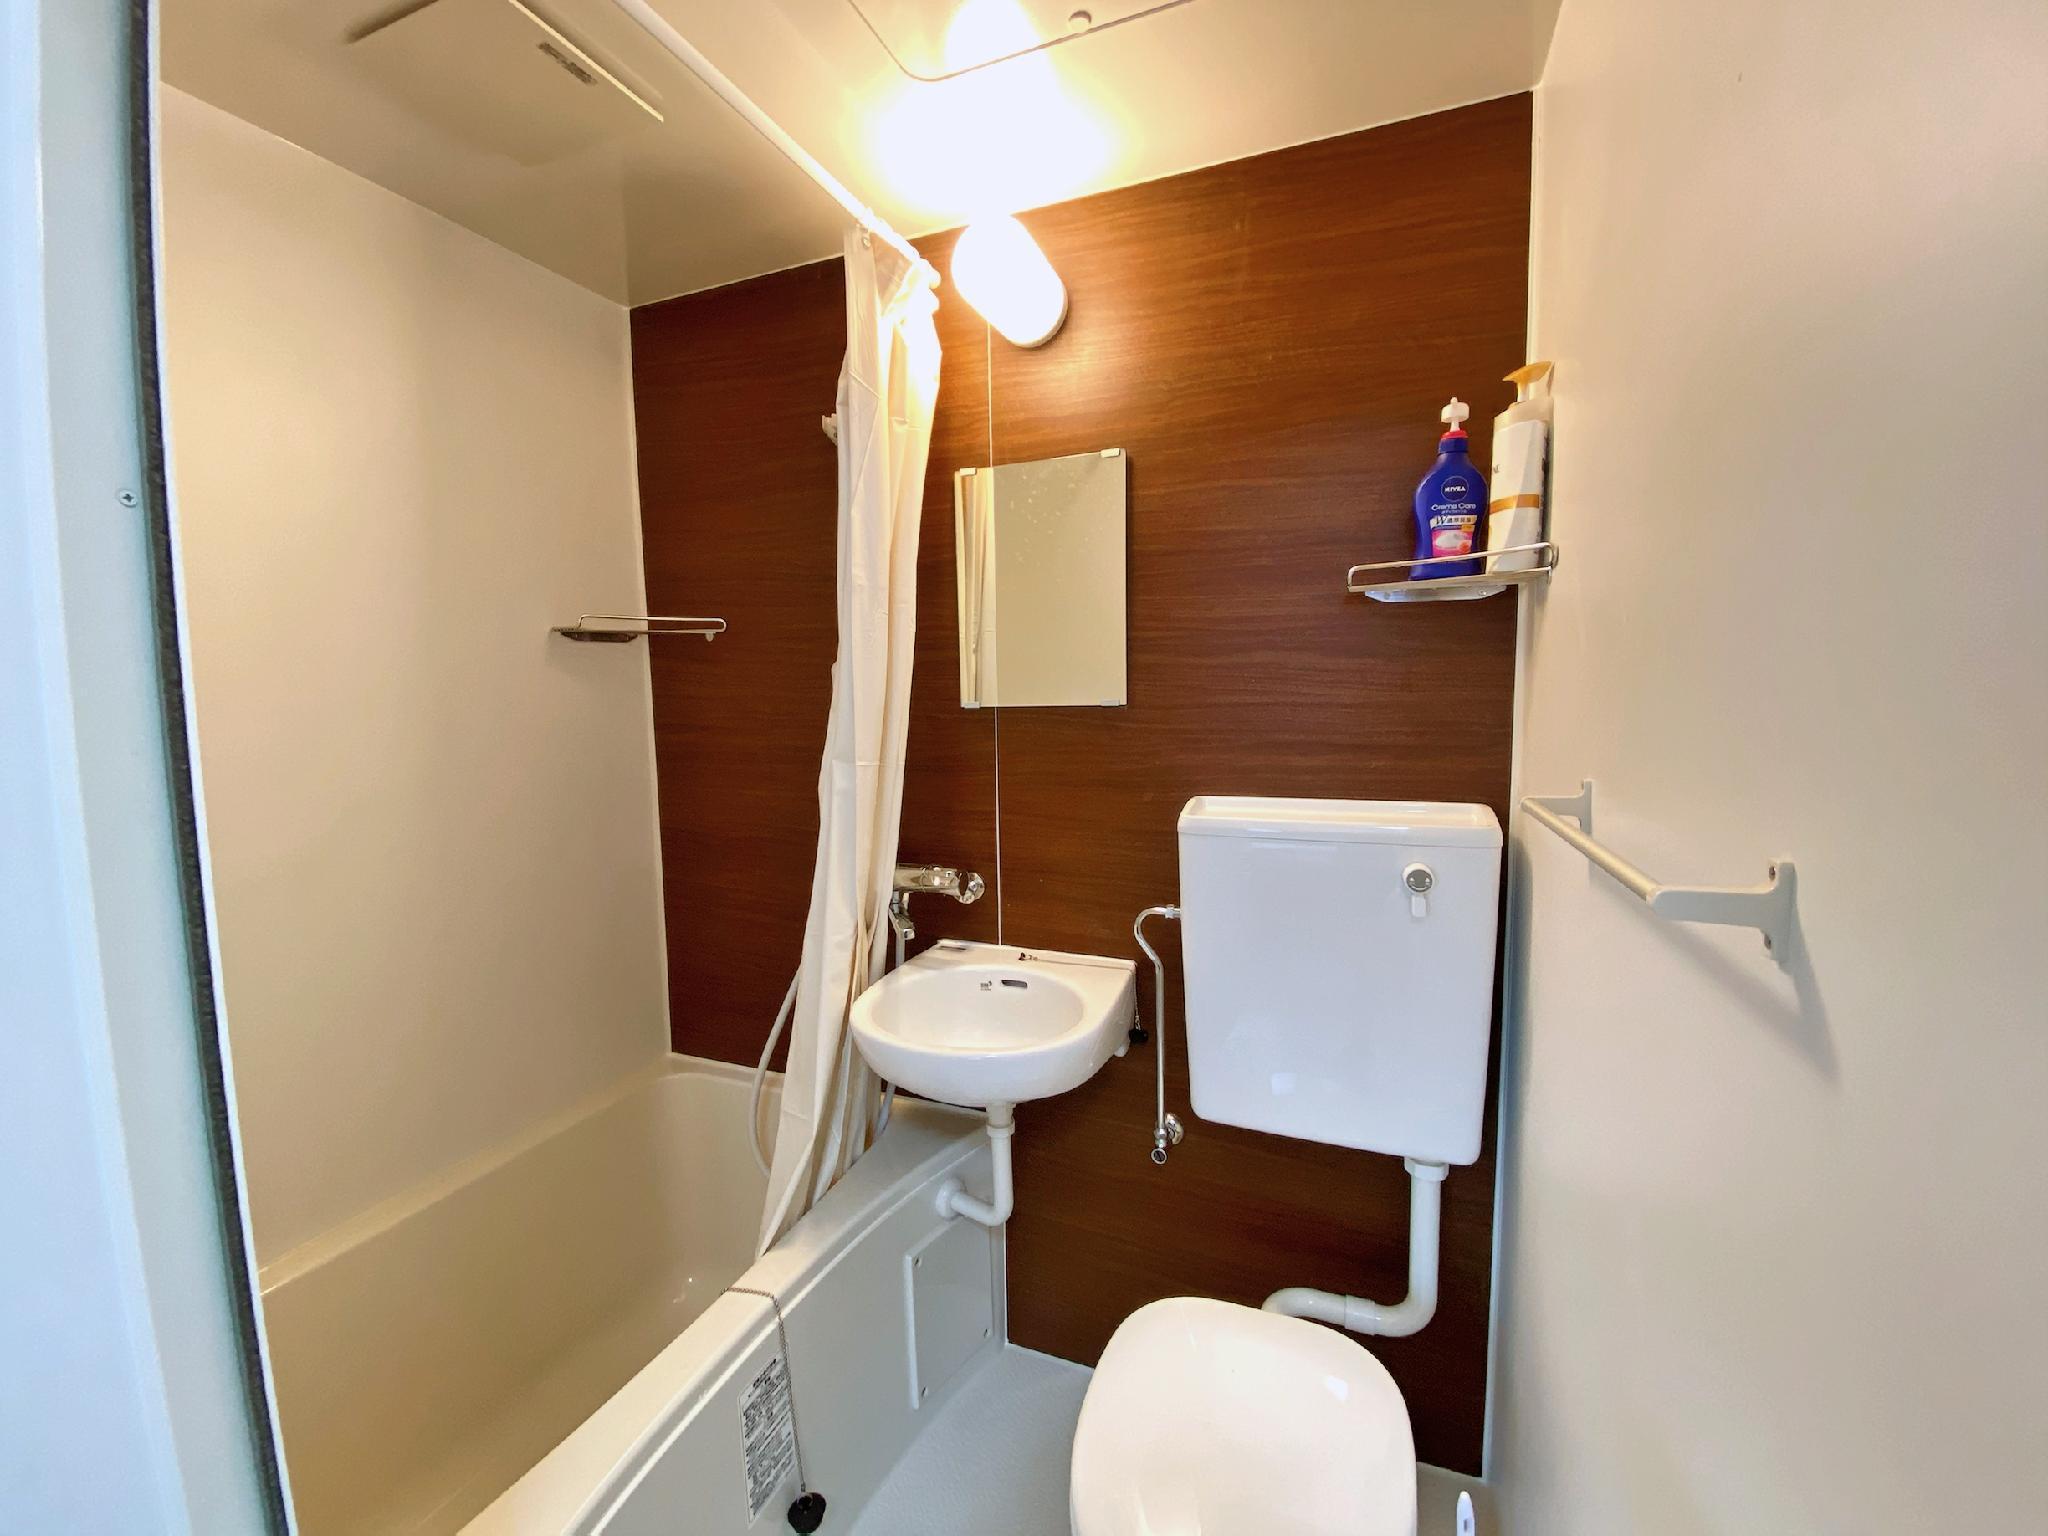 SKYTREE 2bathrooms+2Suite B+C 5 Min Oshiage St.